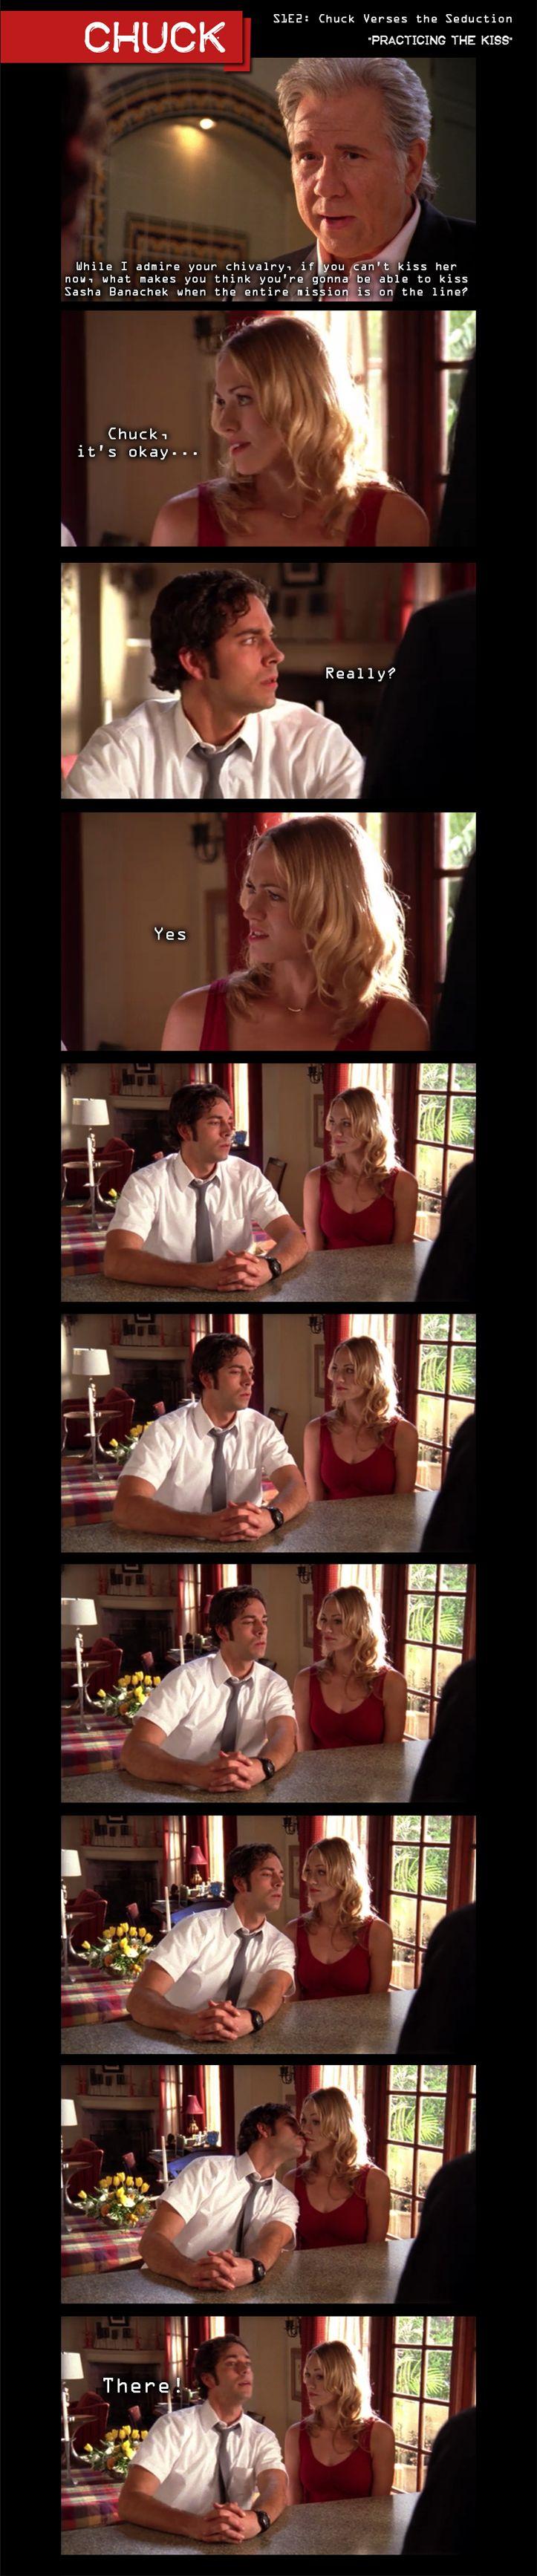 "Chuck: Season 2, Episode 2 ""Chuck Verses the Seduction"". Practicing the kiss...!"